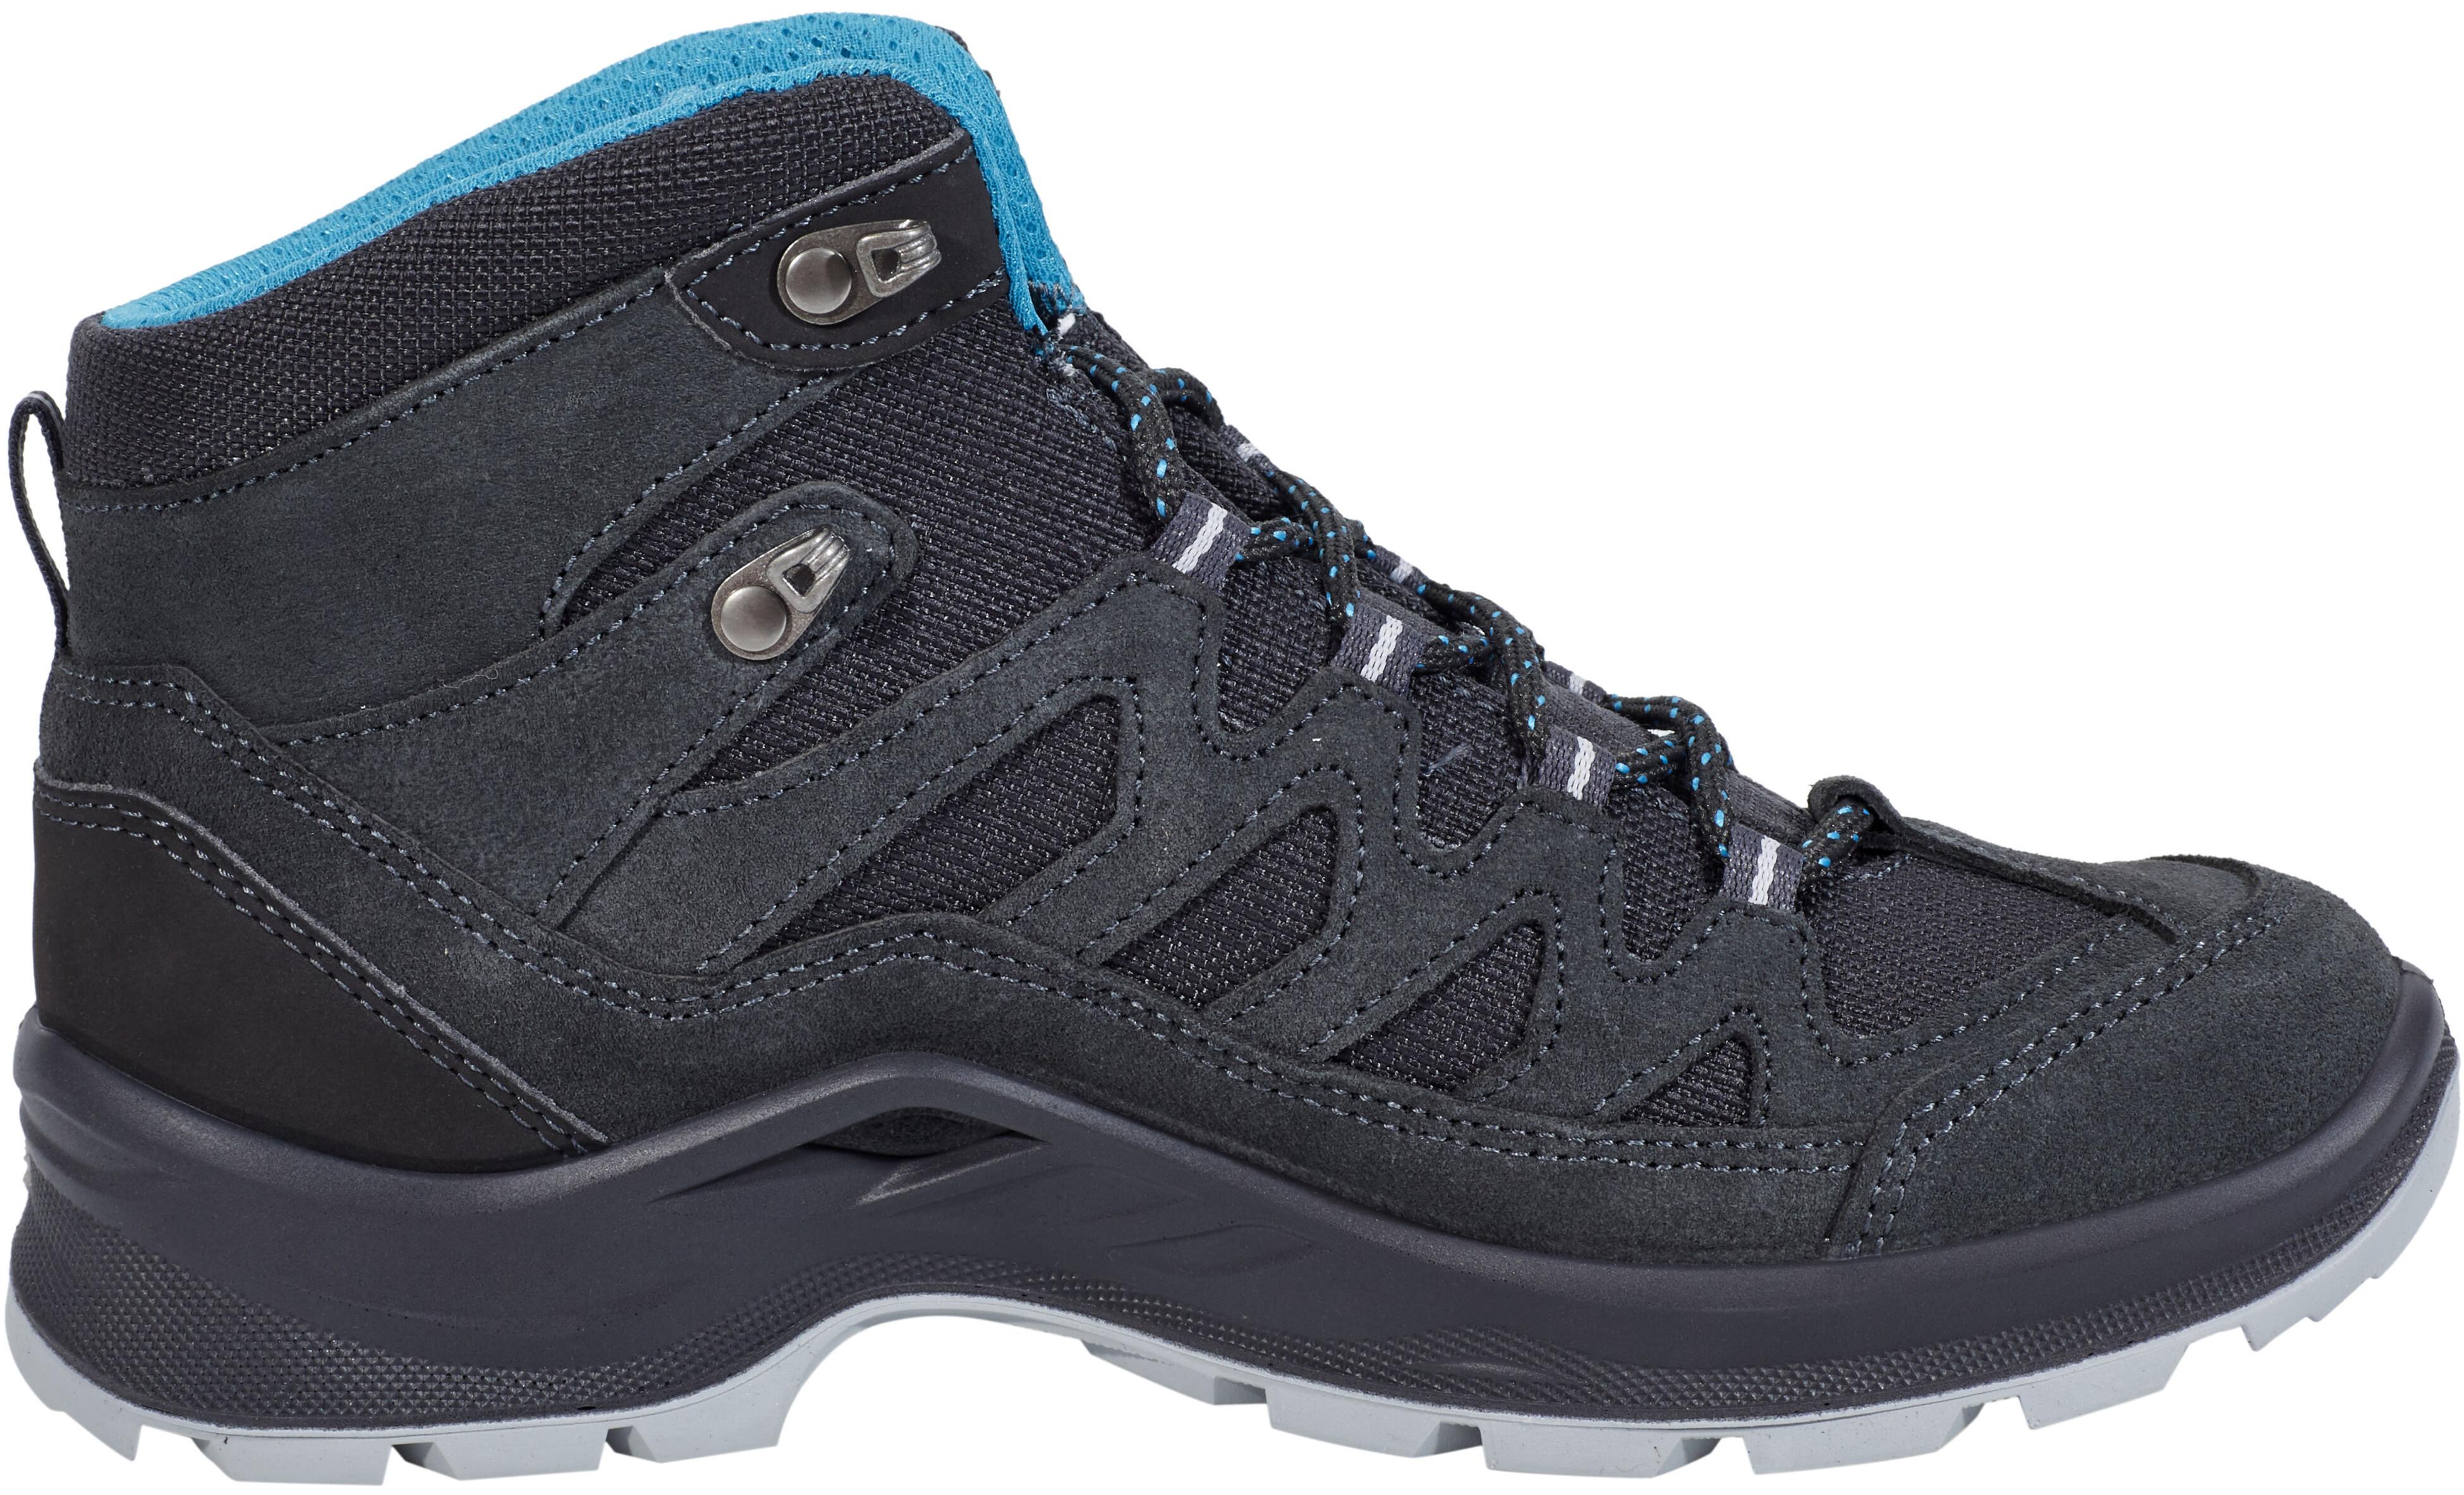 279aeb56bcba27 Lowa Levante GTX QC Shoes Women grey at Addnature.co.uk